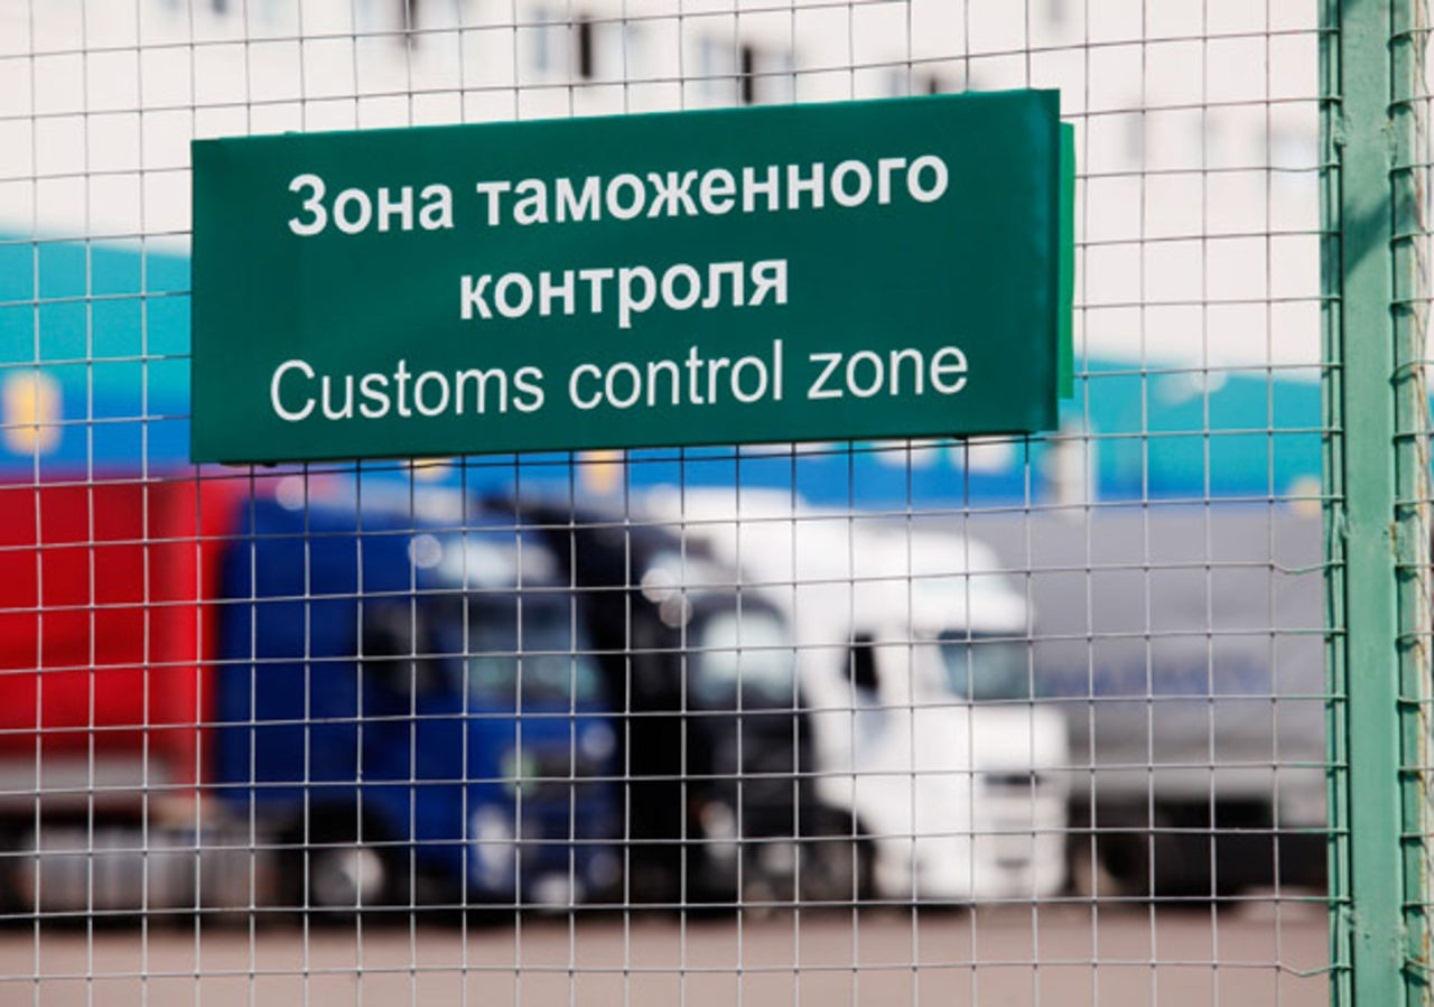 Вход в зону таможенного контроля